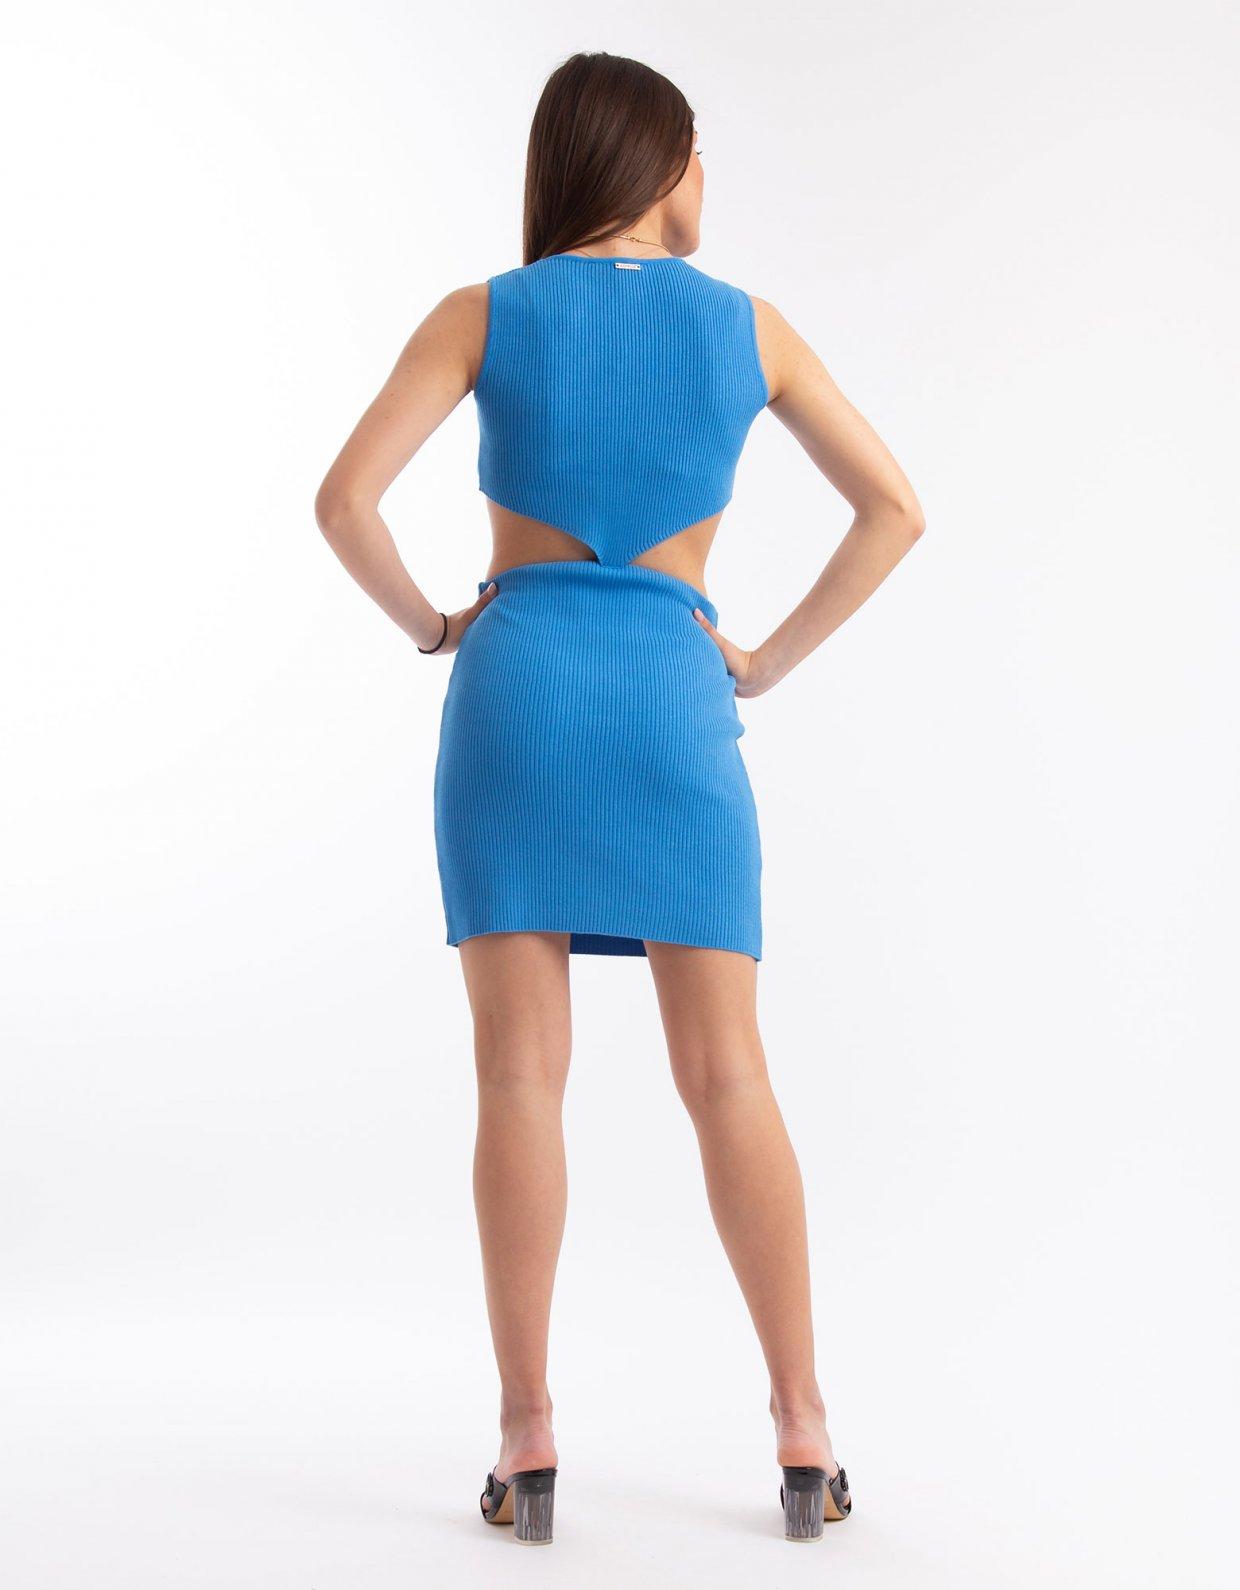 Combos Knitwear Combos S20 – Blue mini dress